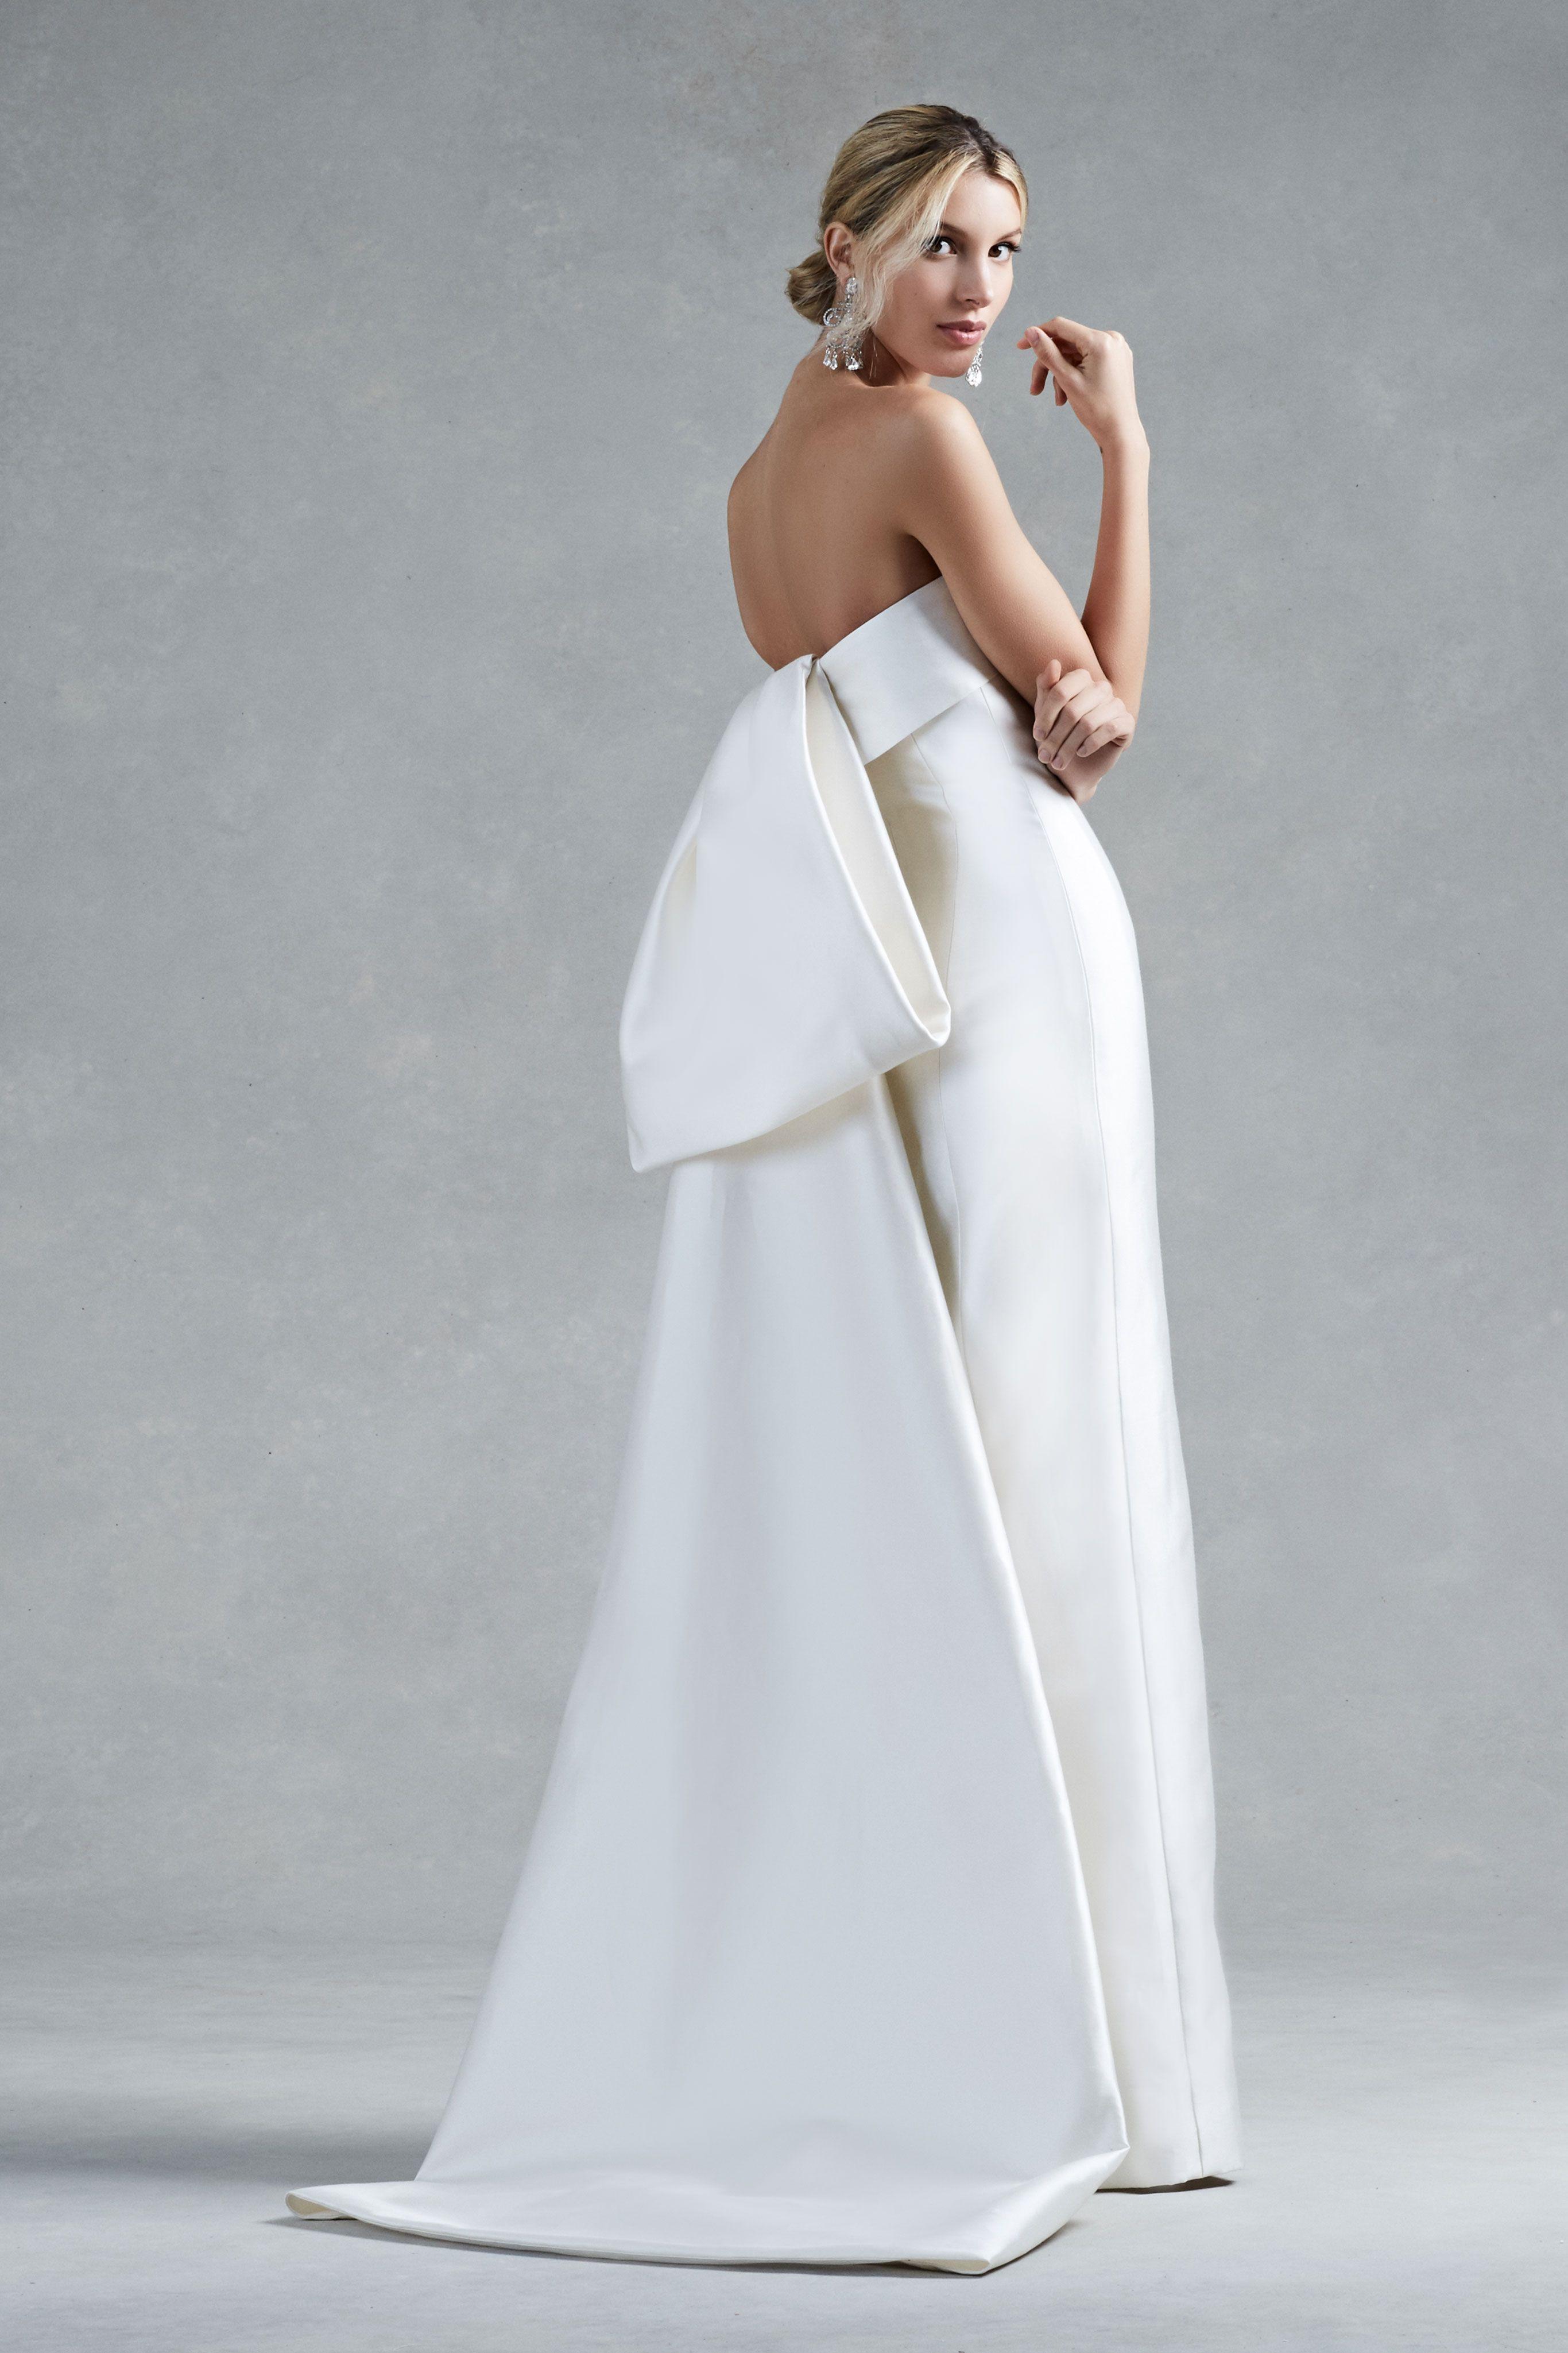 Wedding dress with bow on back  Oscar de la Renta Fall  Bridal  Dress  Pinterest  Oscars